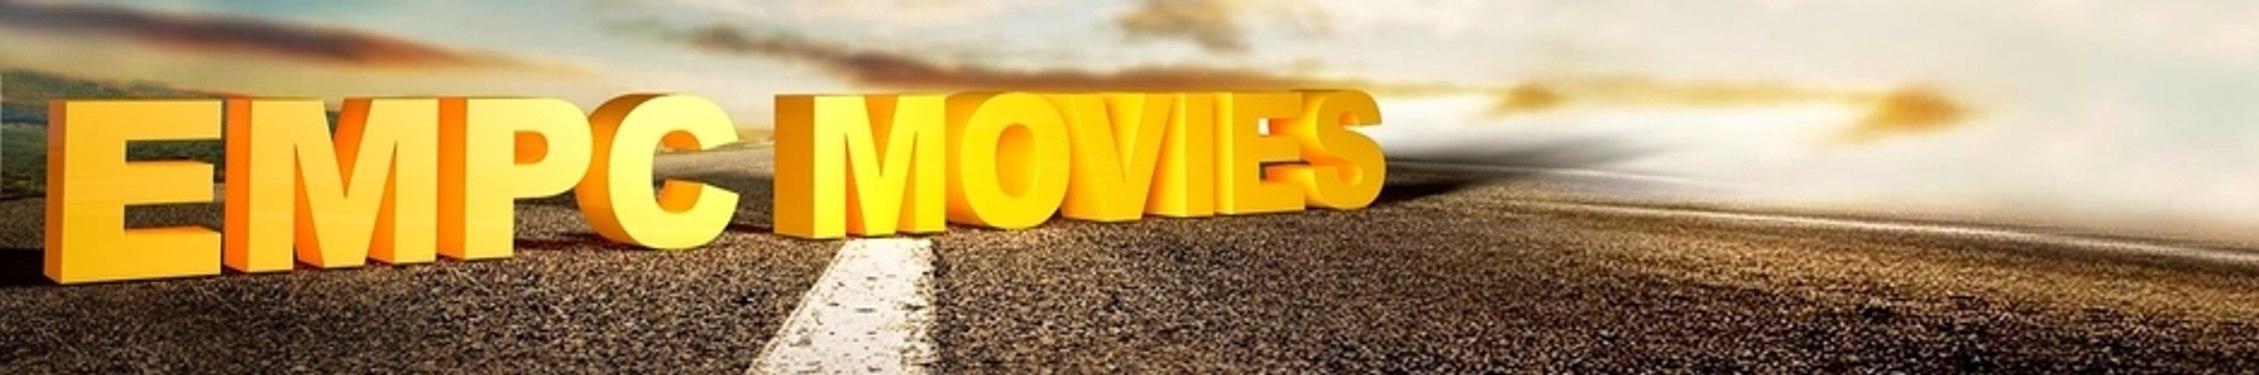 EMPC Movies